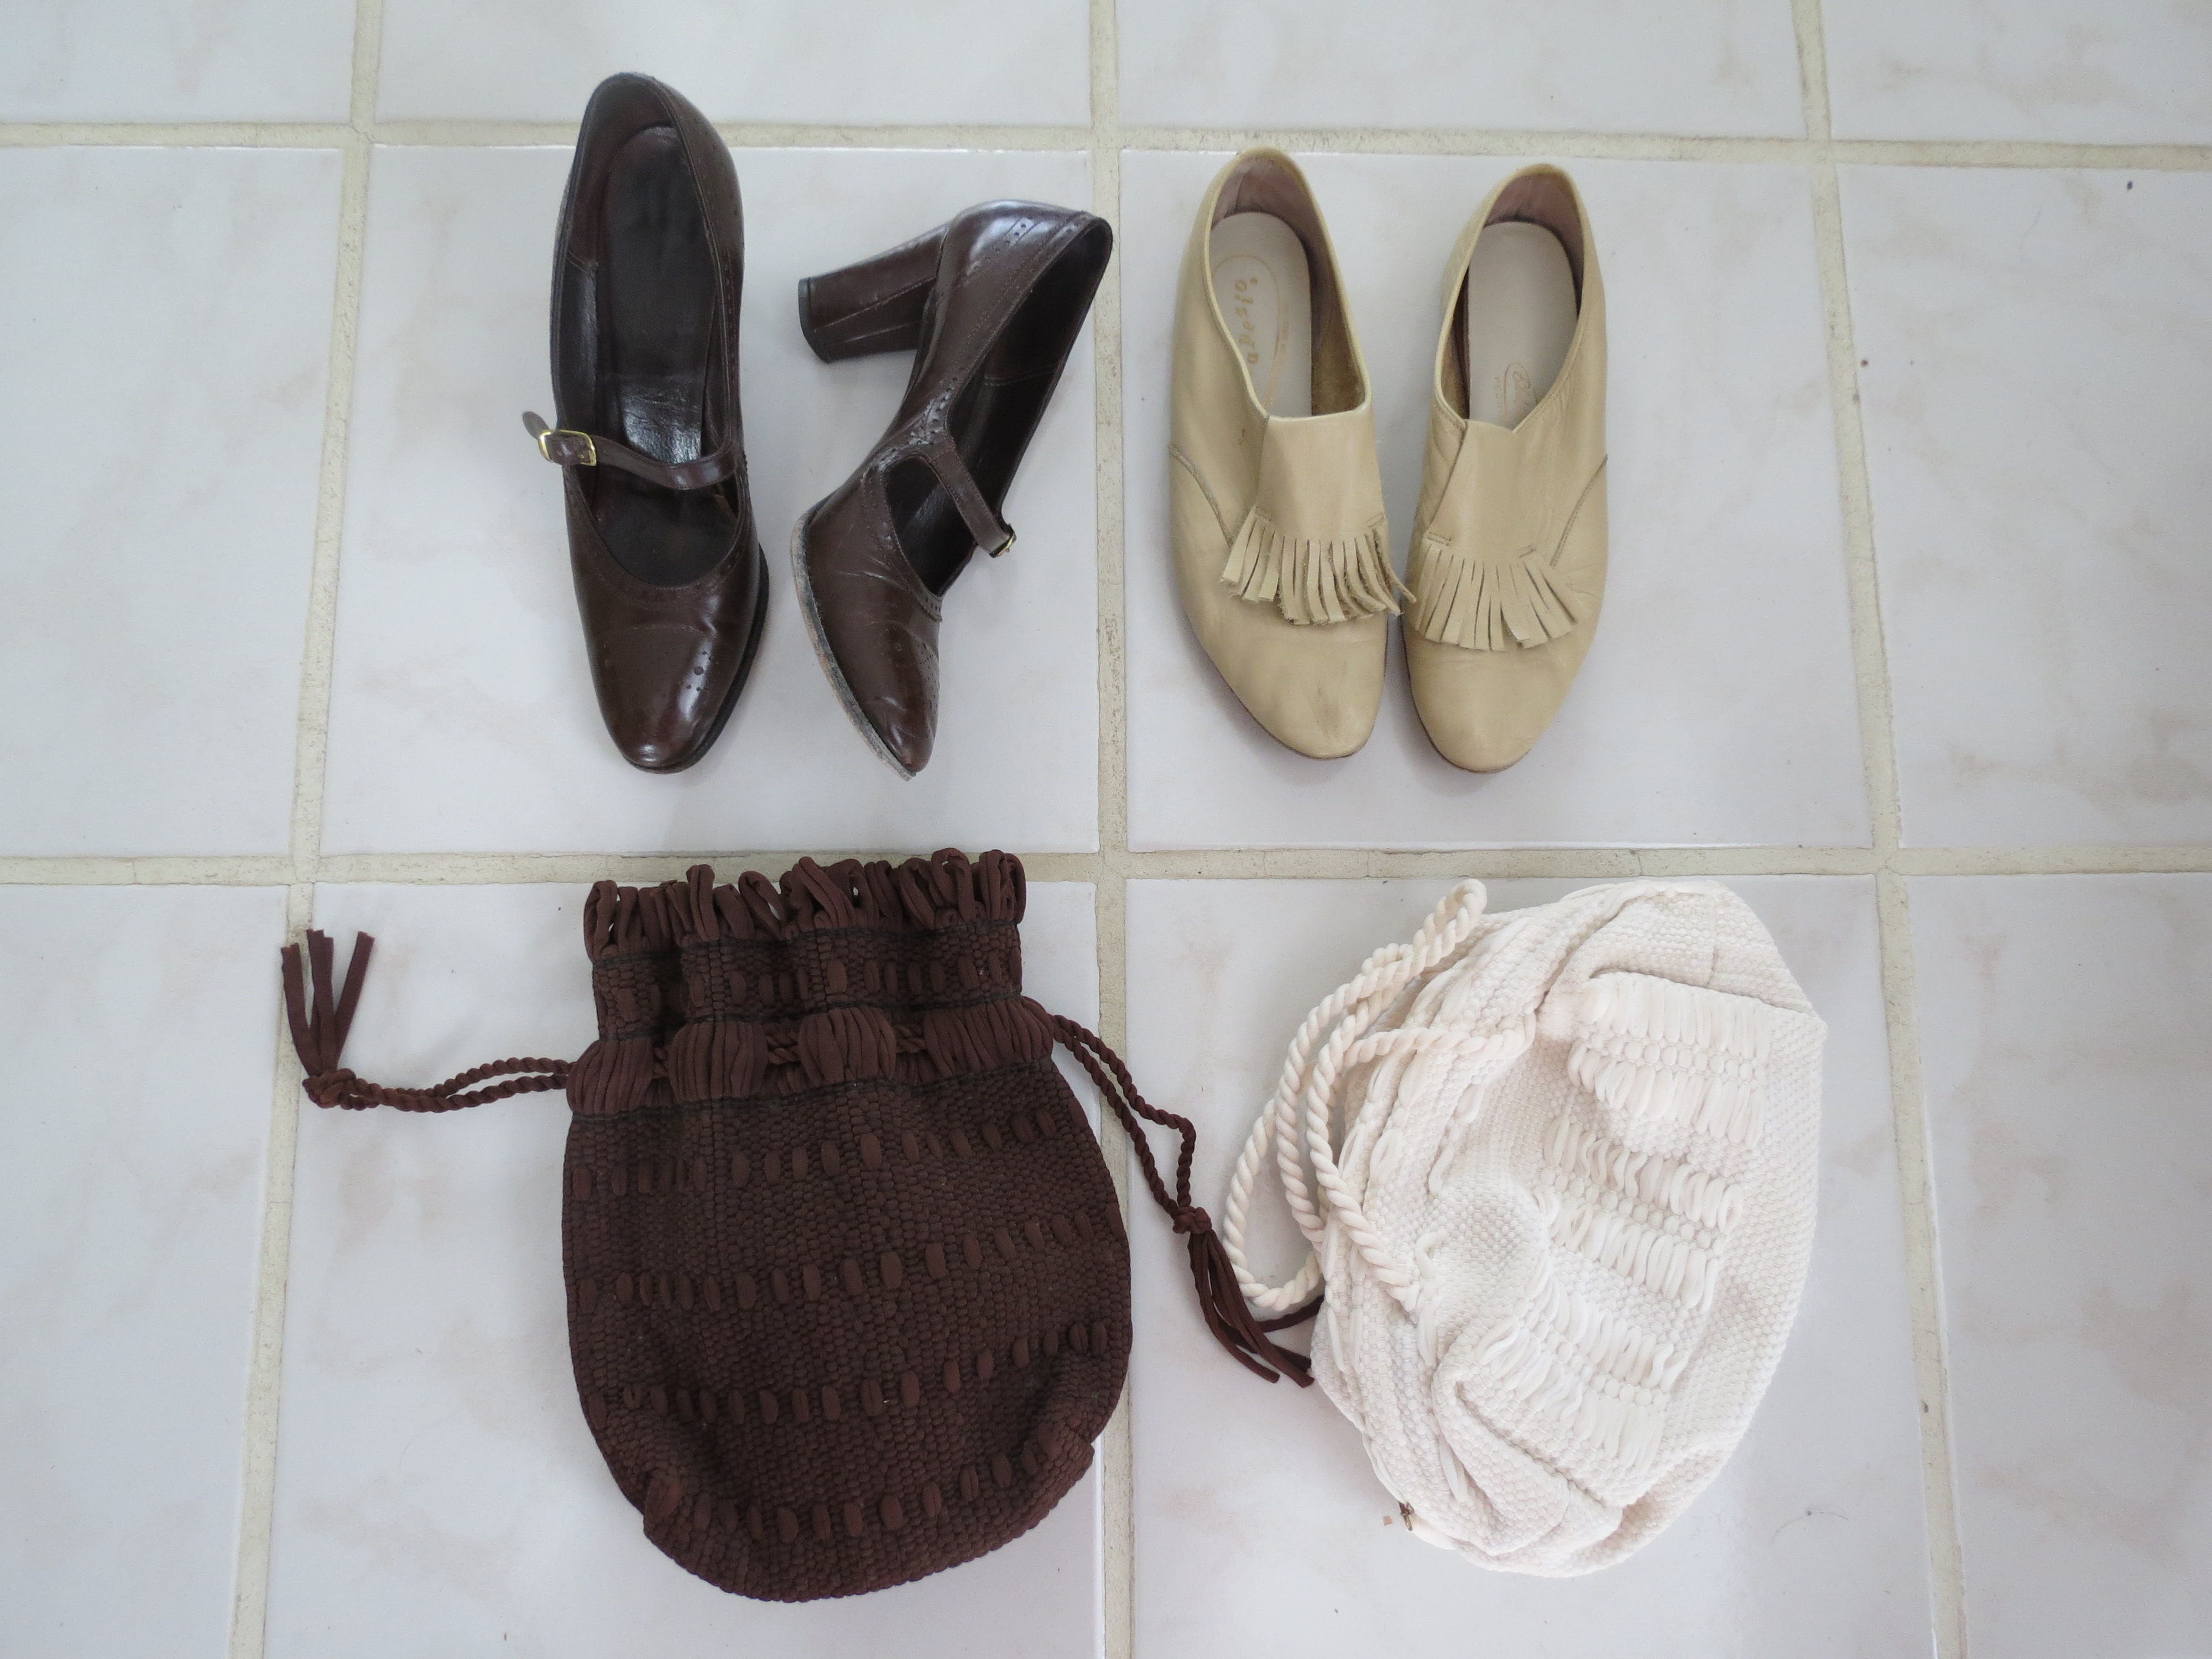 A Few 1940s Wardrobe Staples